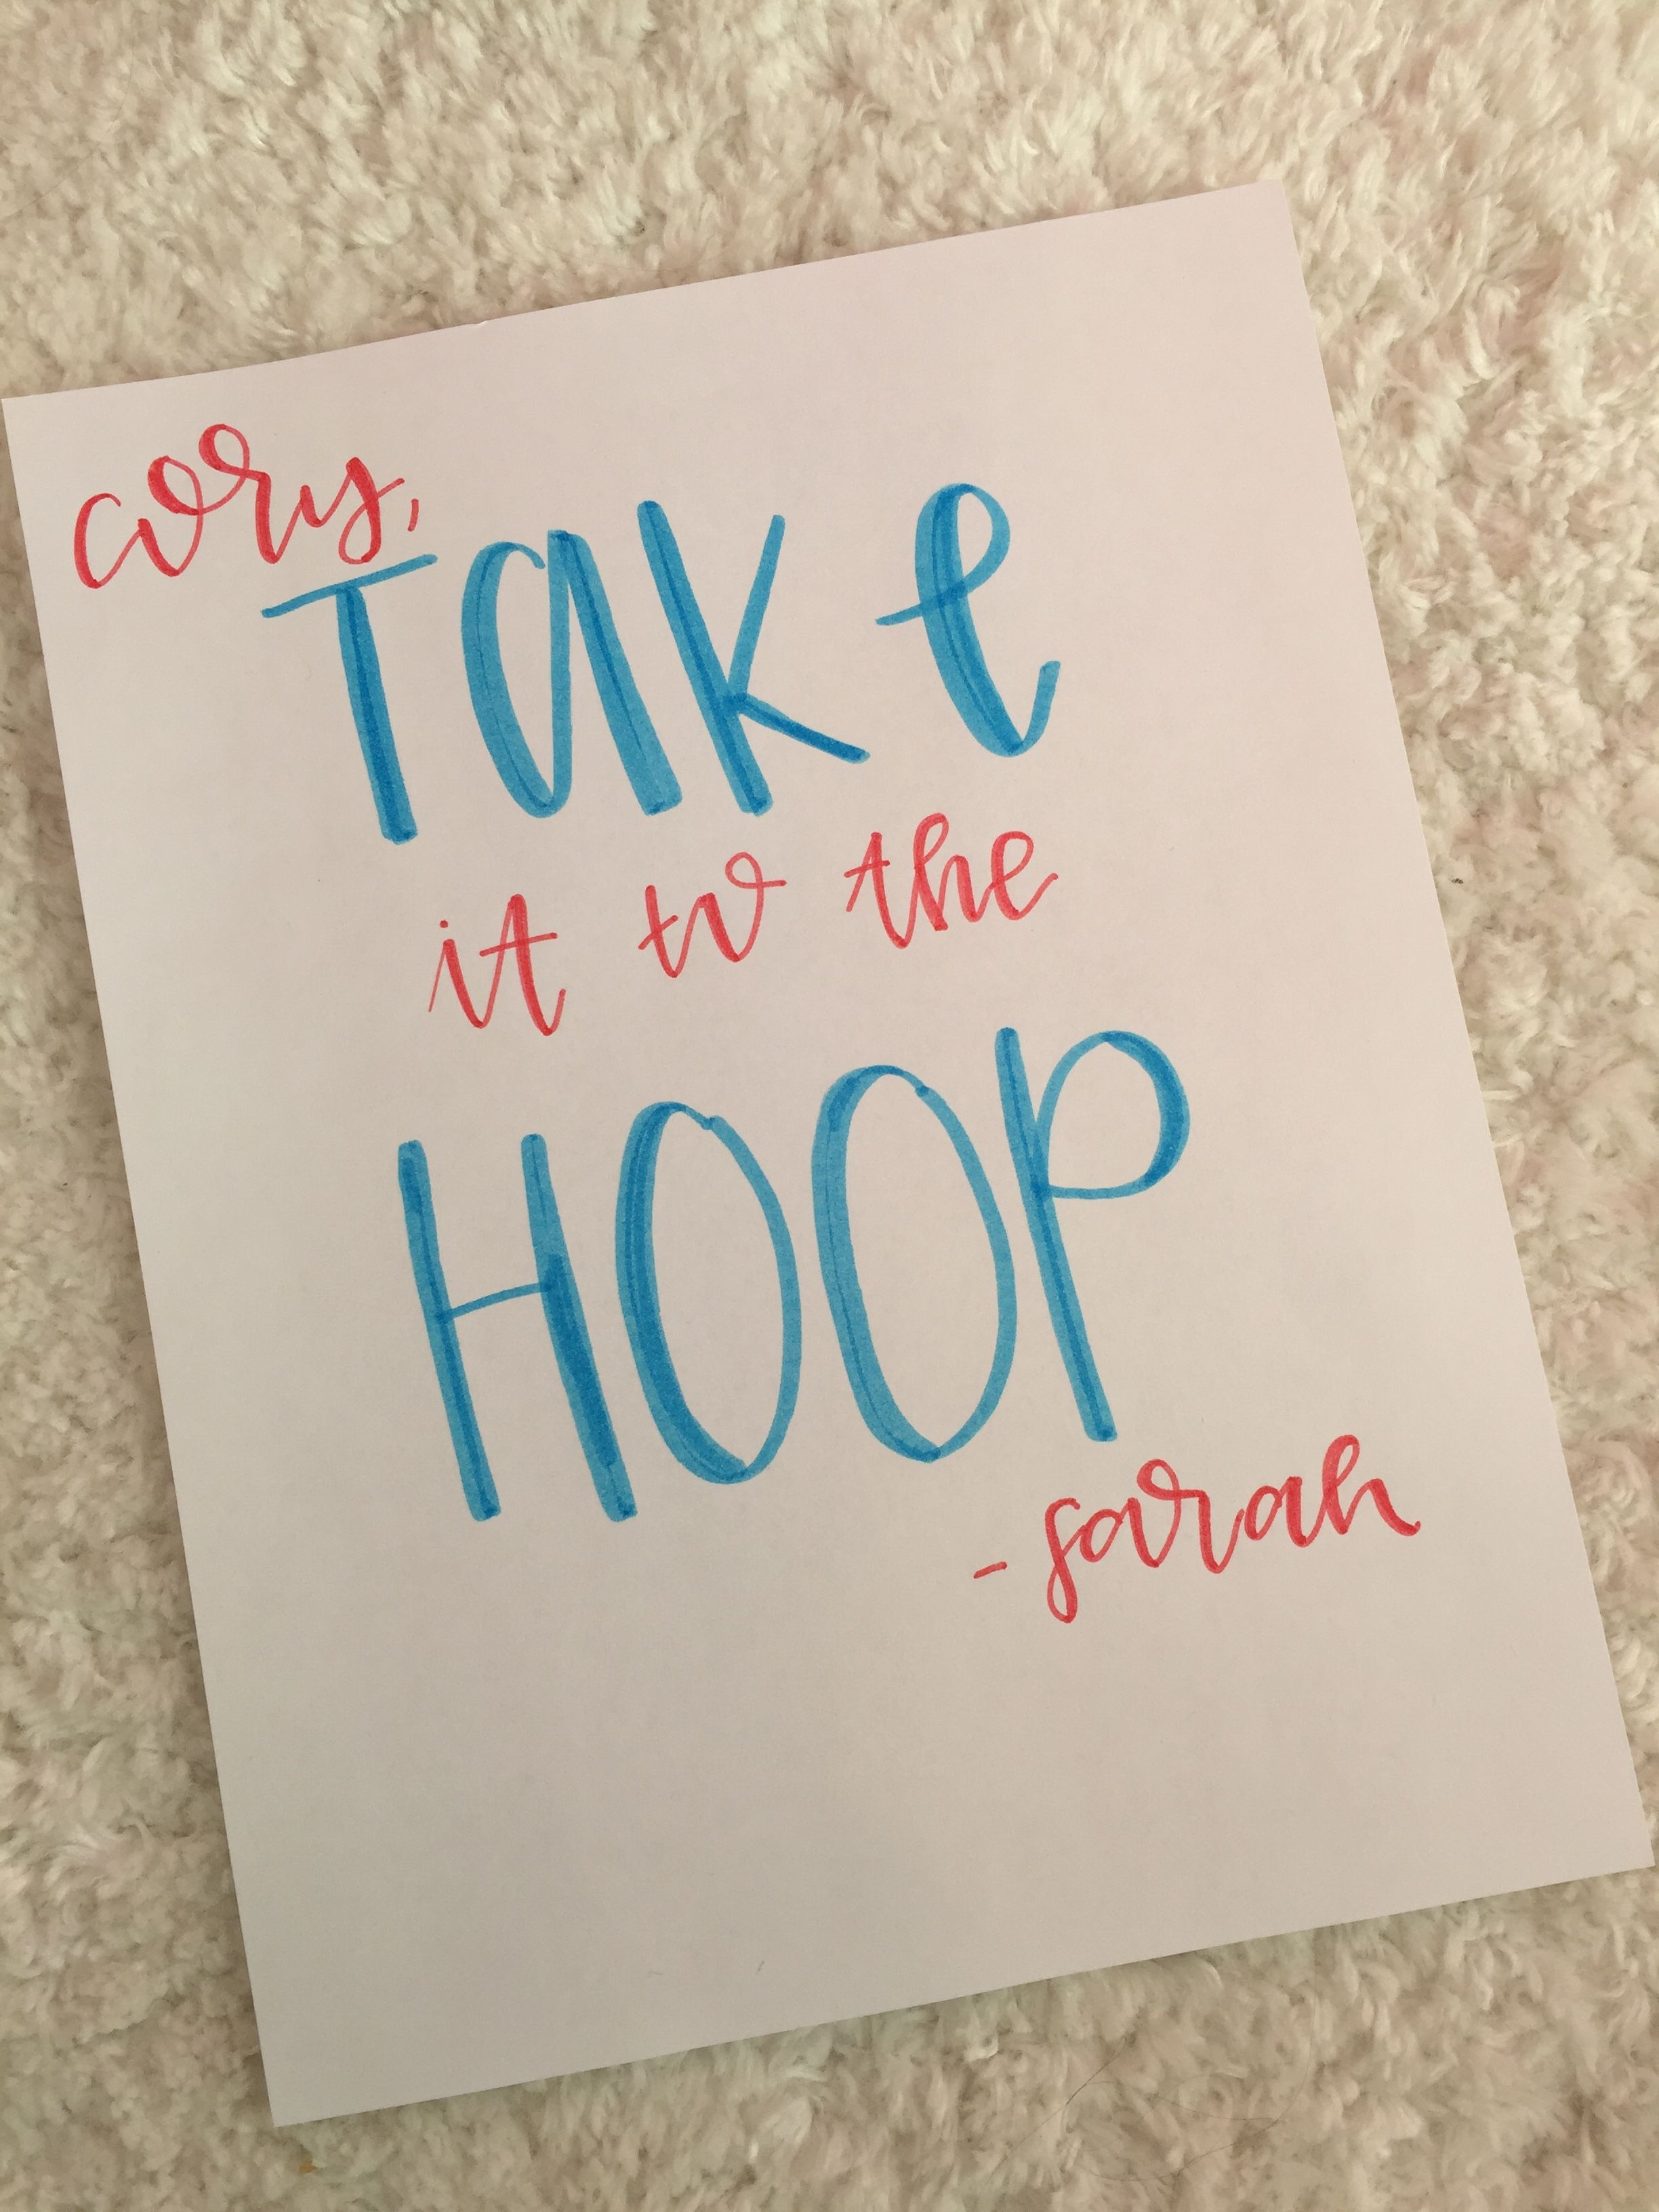 10 Gorgeous High School Basketball Poster Ideas basketball poster take it to the hoop basketball poster idea high 2020